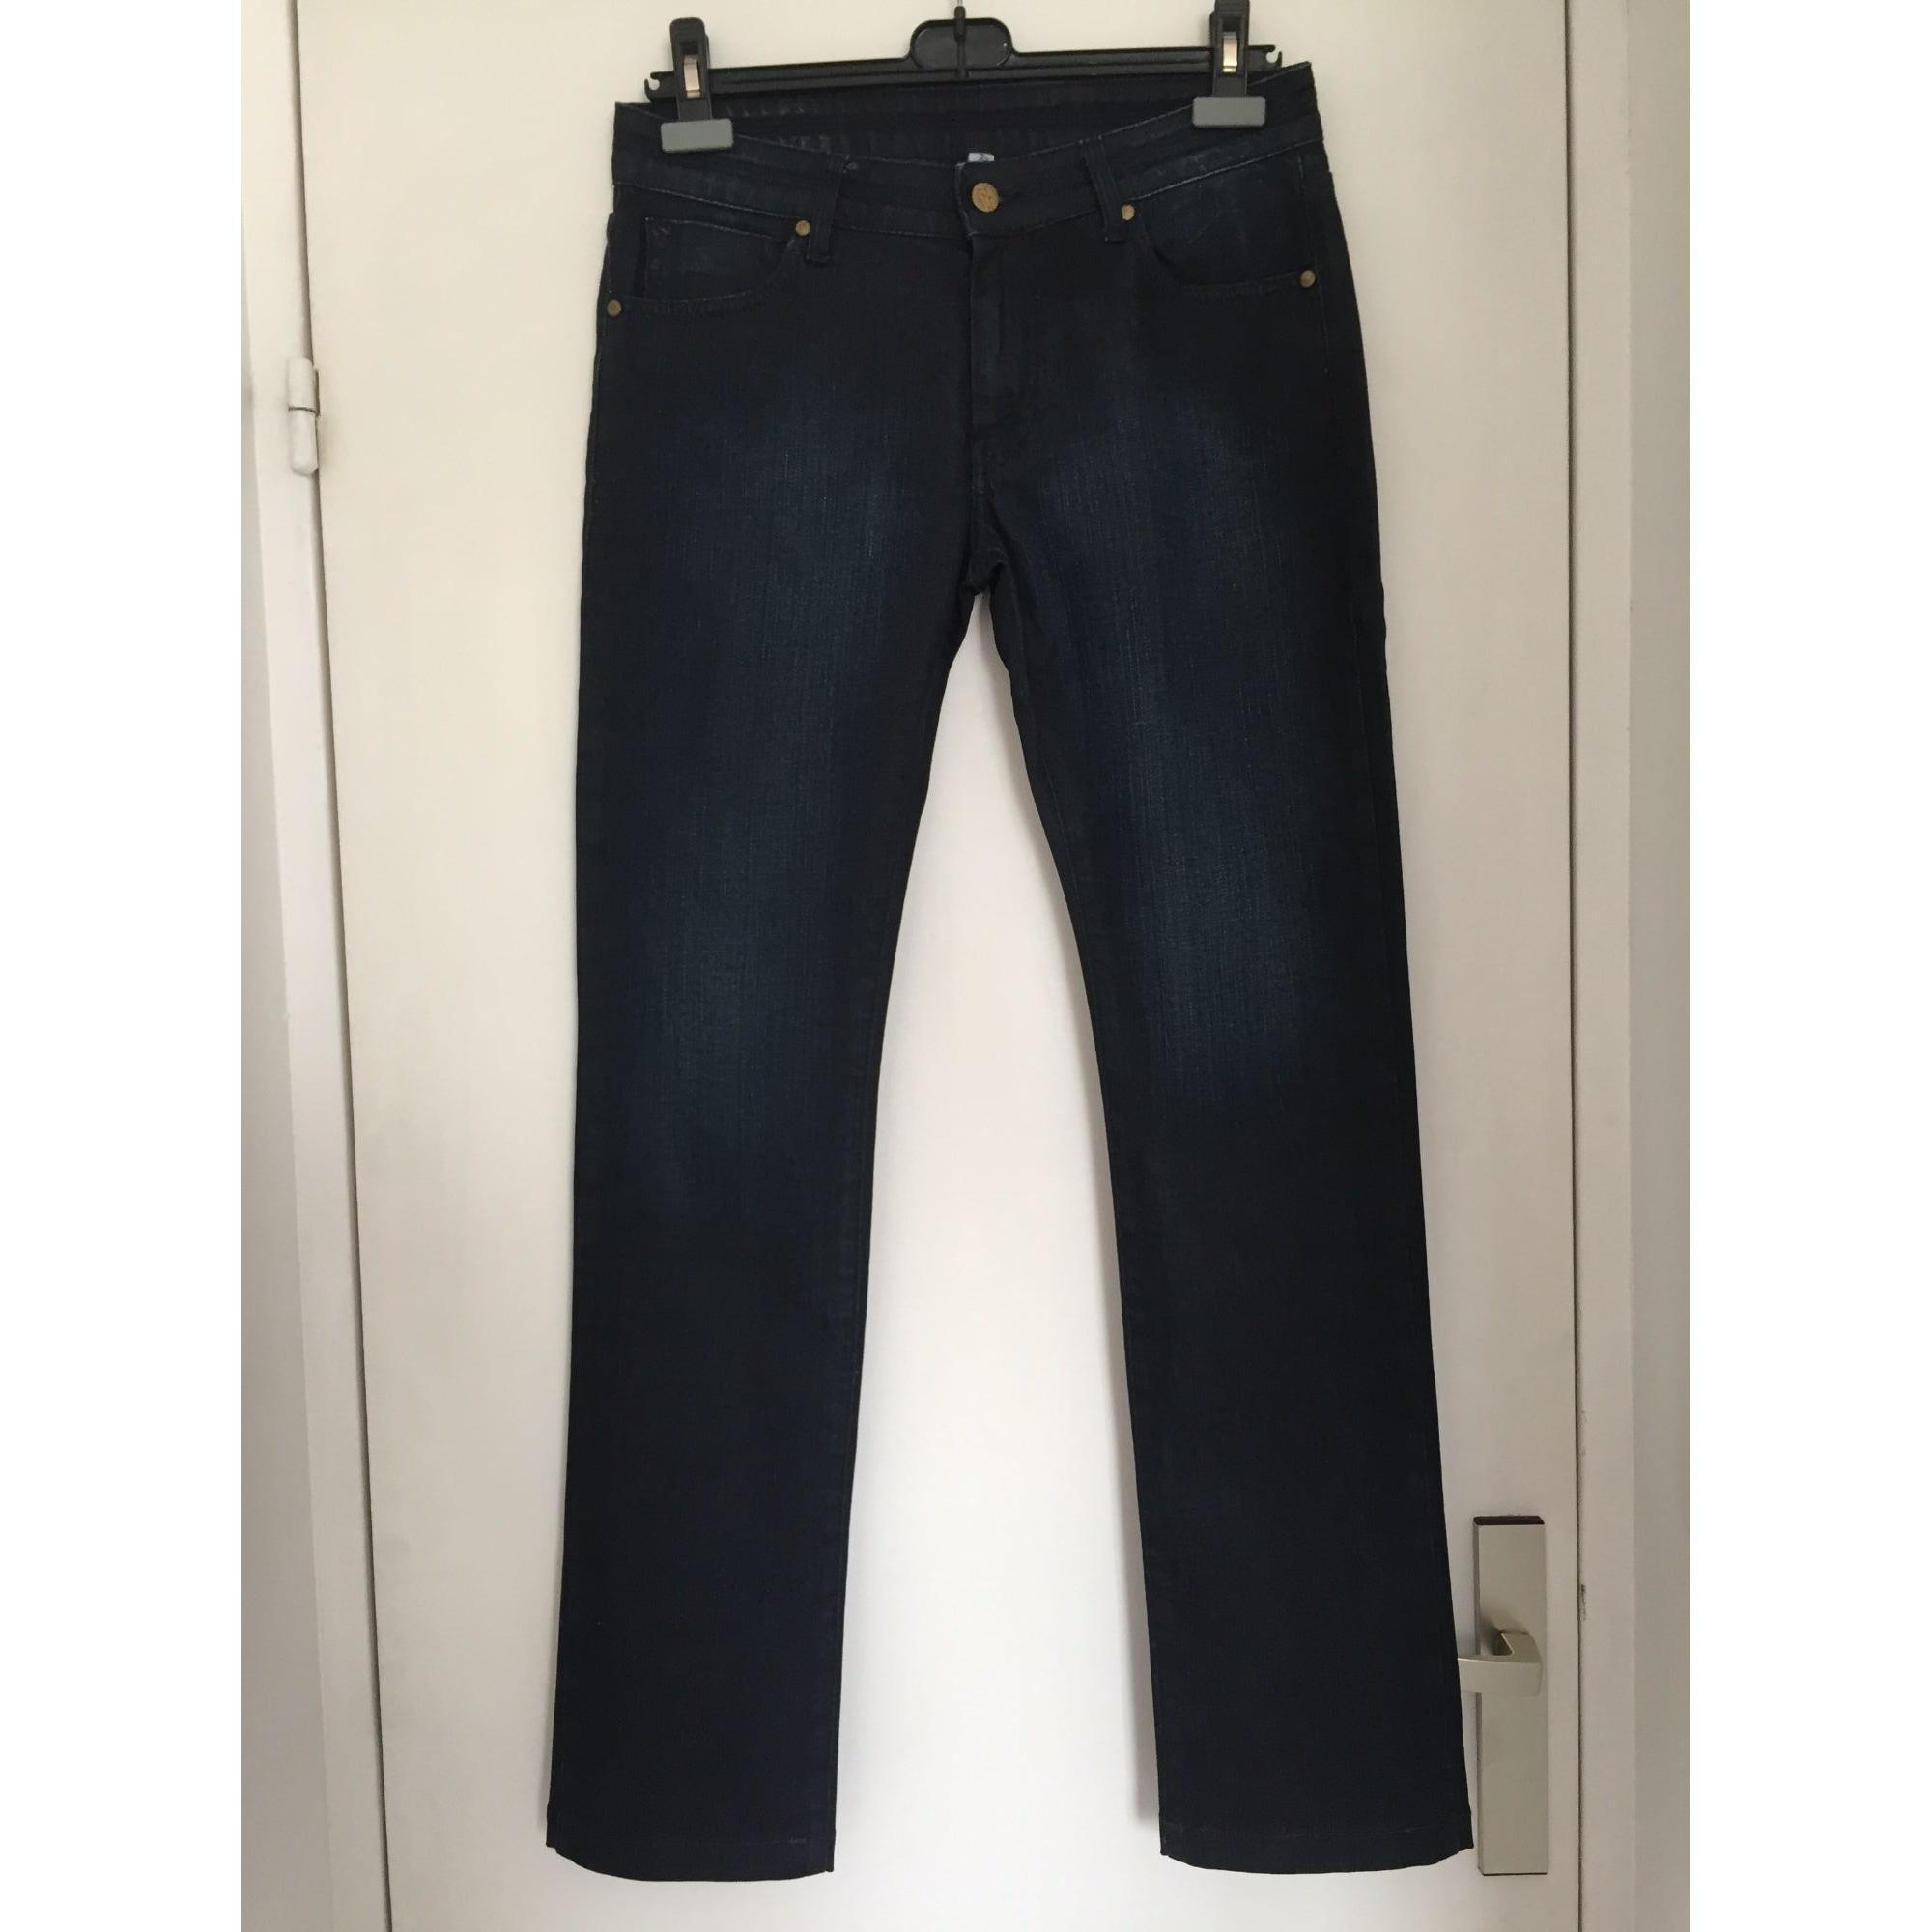 Jeans droit ACQUAVERDE Bleu, bleu marine, bleu turquoise